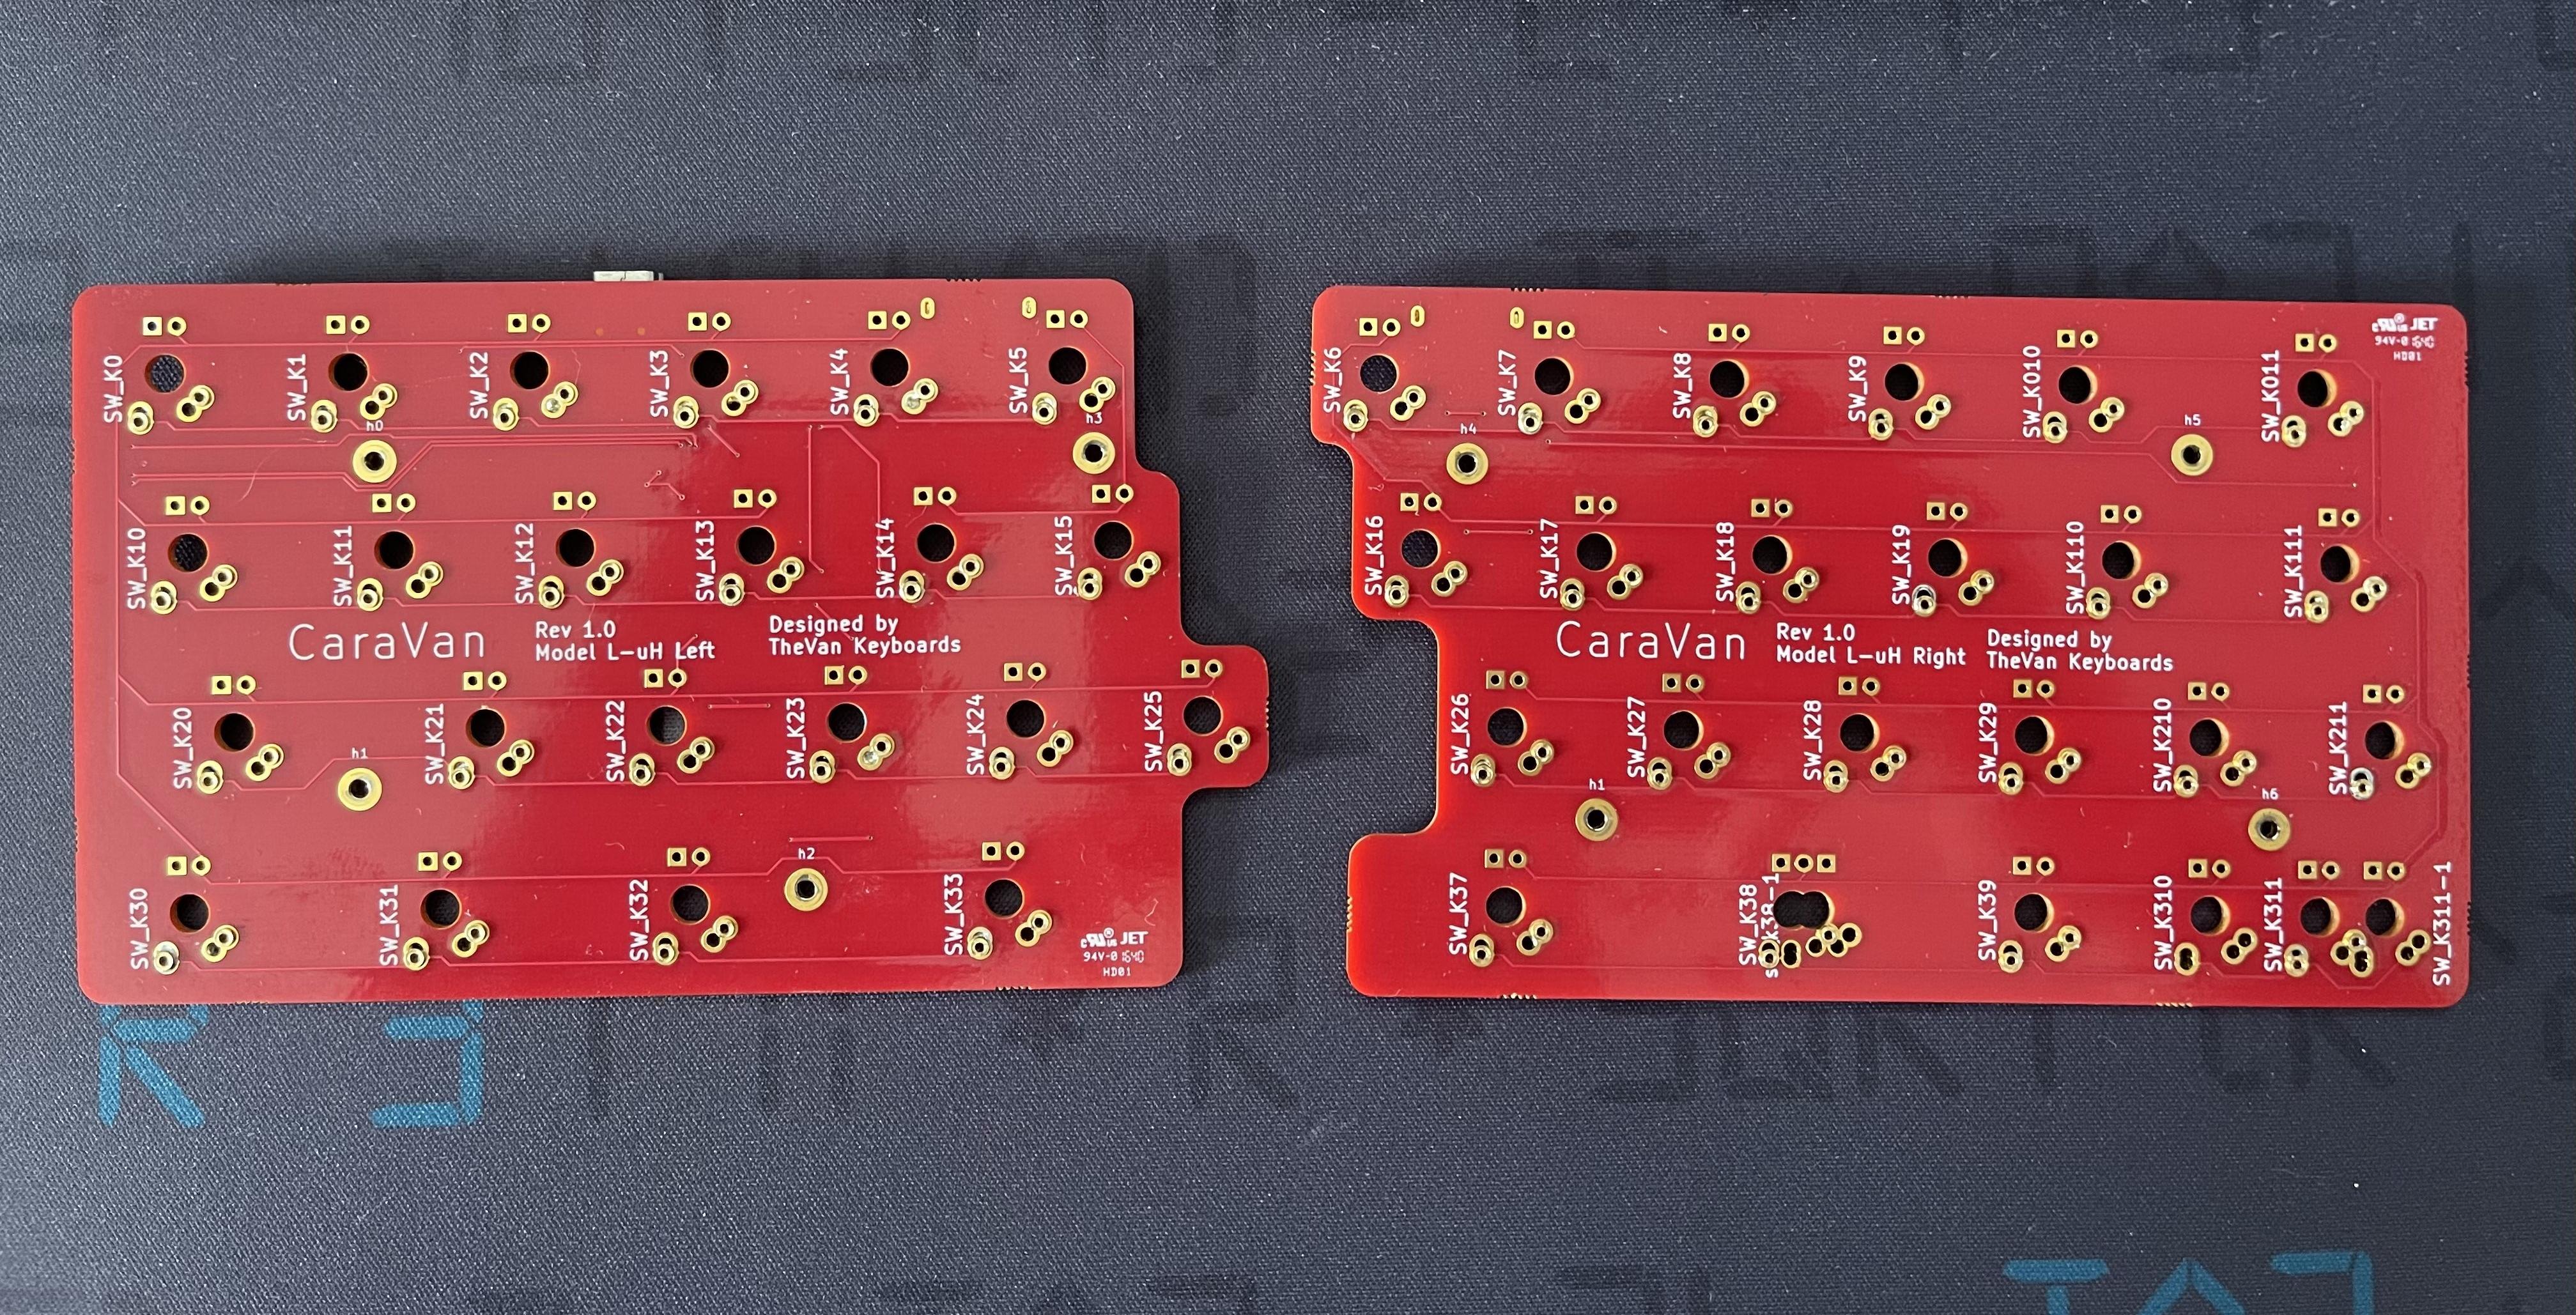 CaraVan prototype PCB front